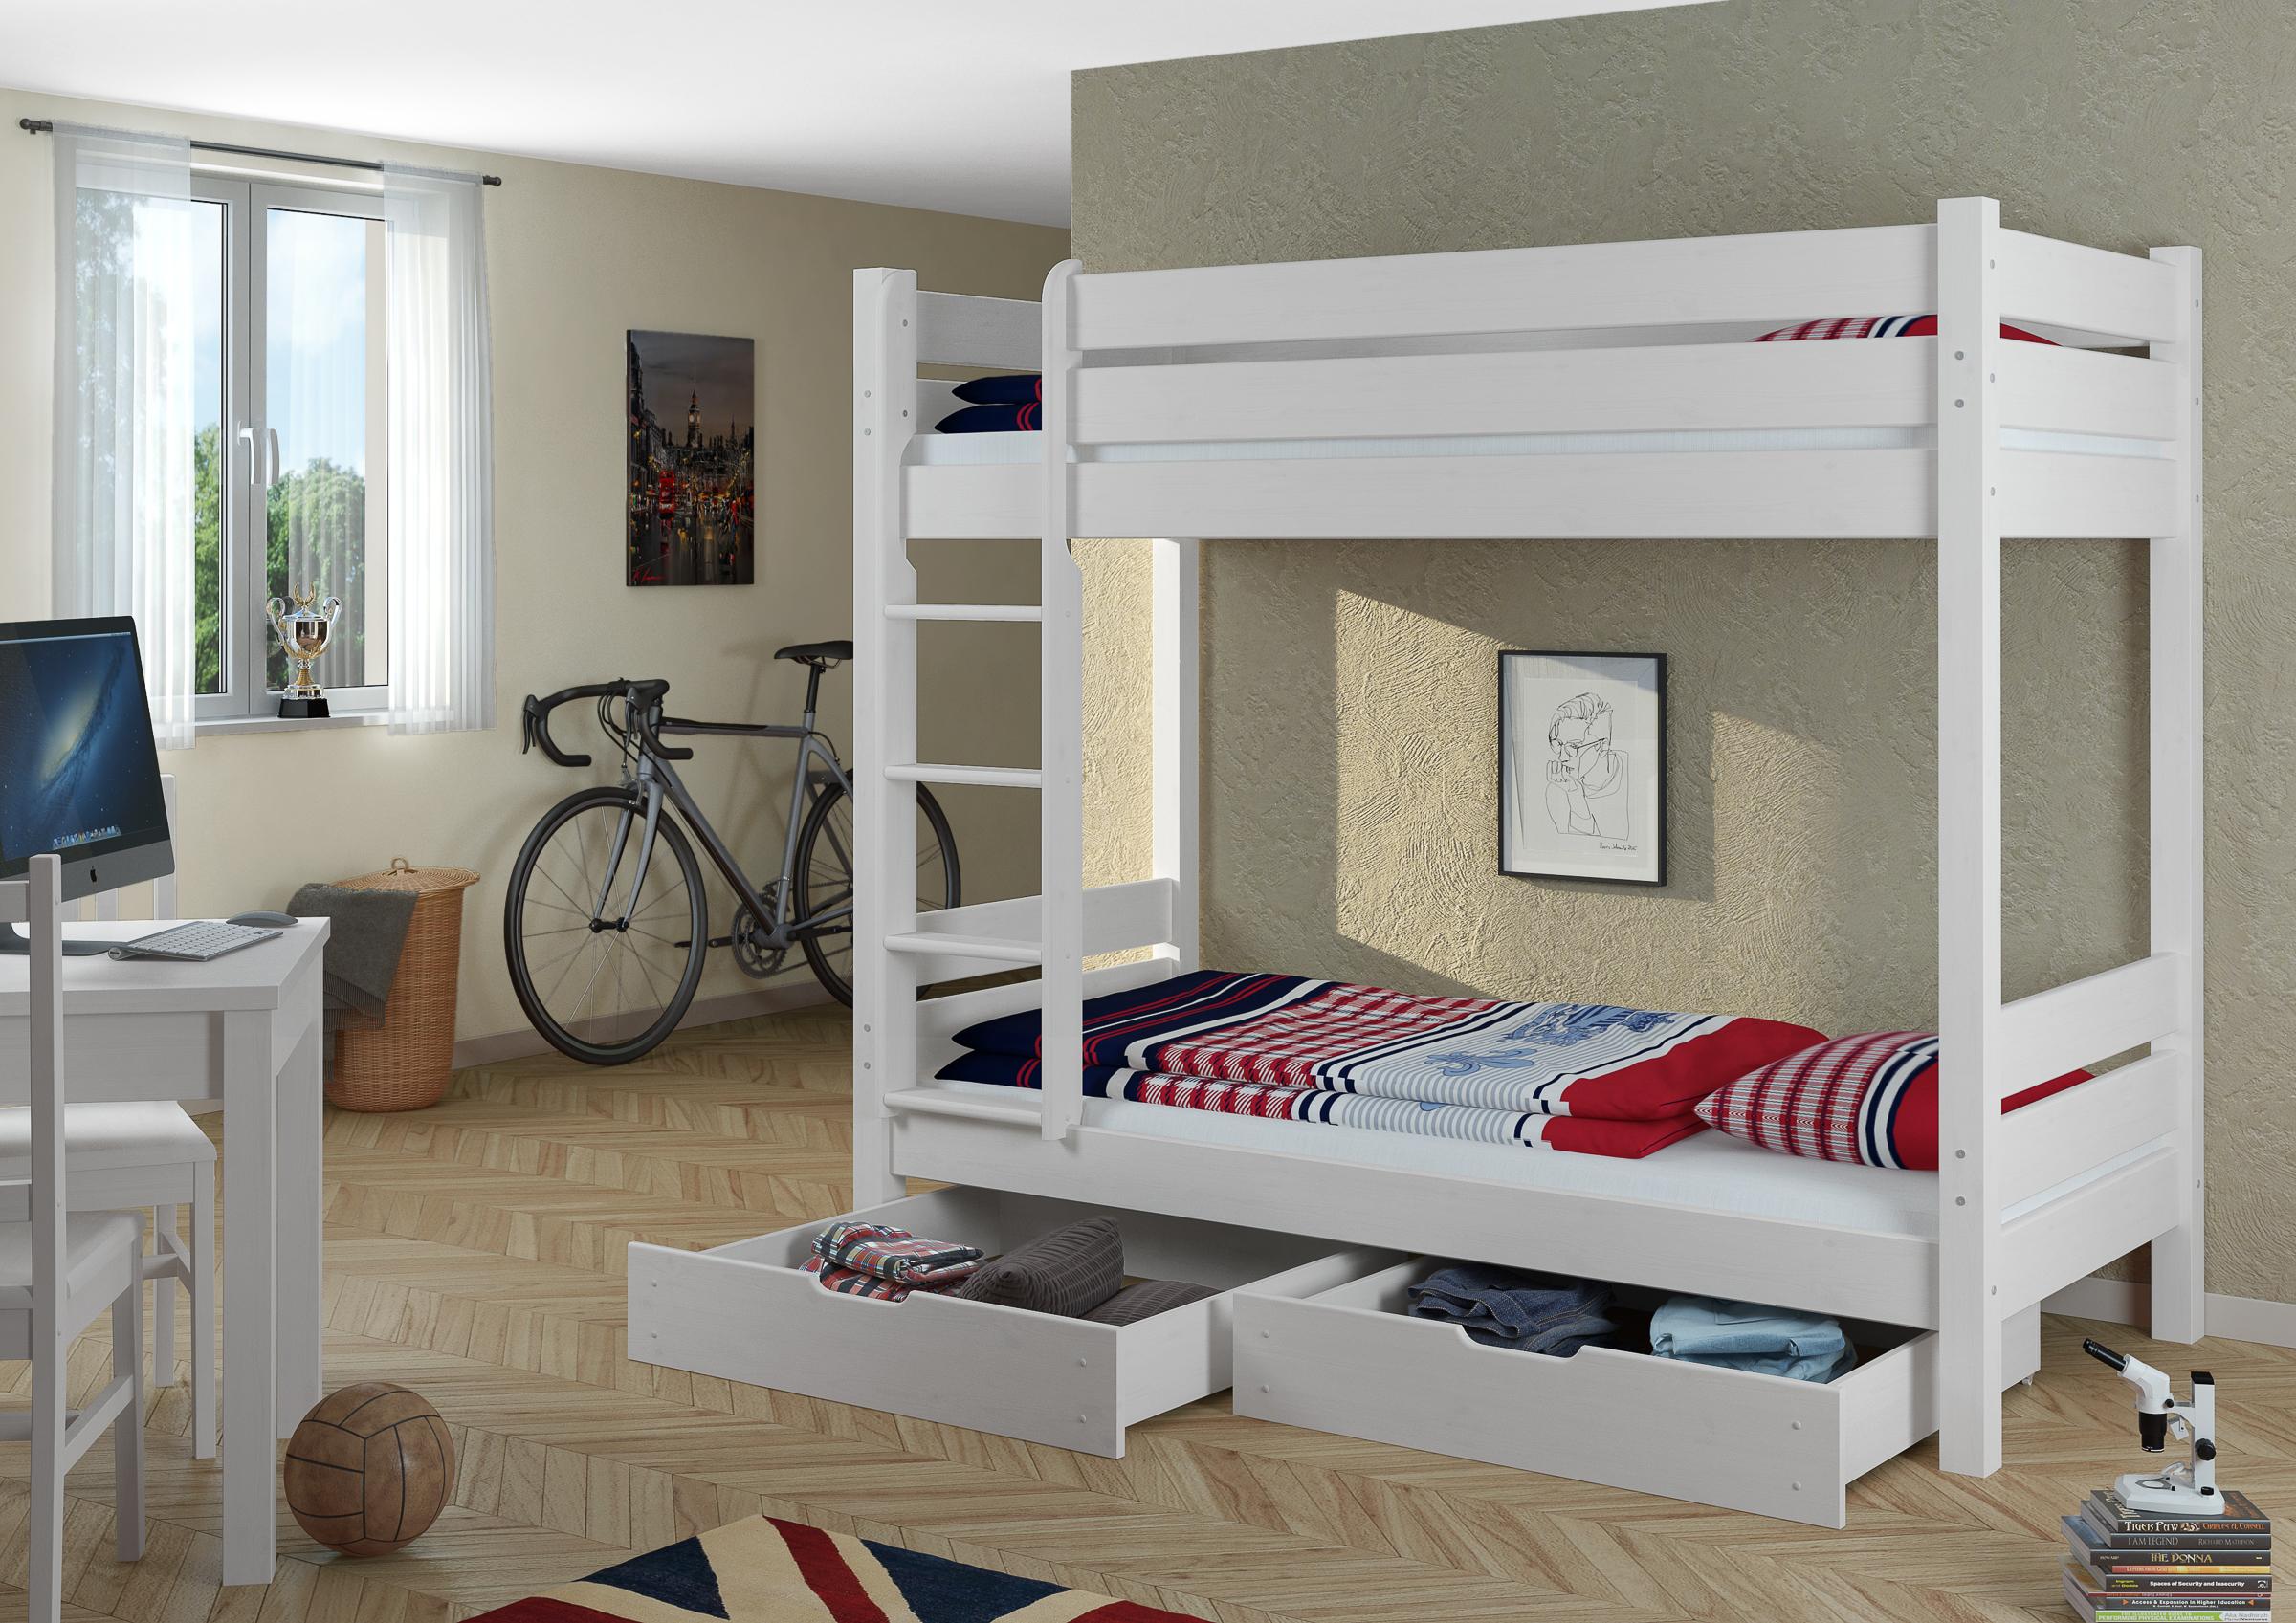 teilbares etagenbett erwachsene 90x200 matratzen. Black Bedroom Furniture Sets. Home Design Ideas